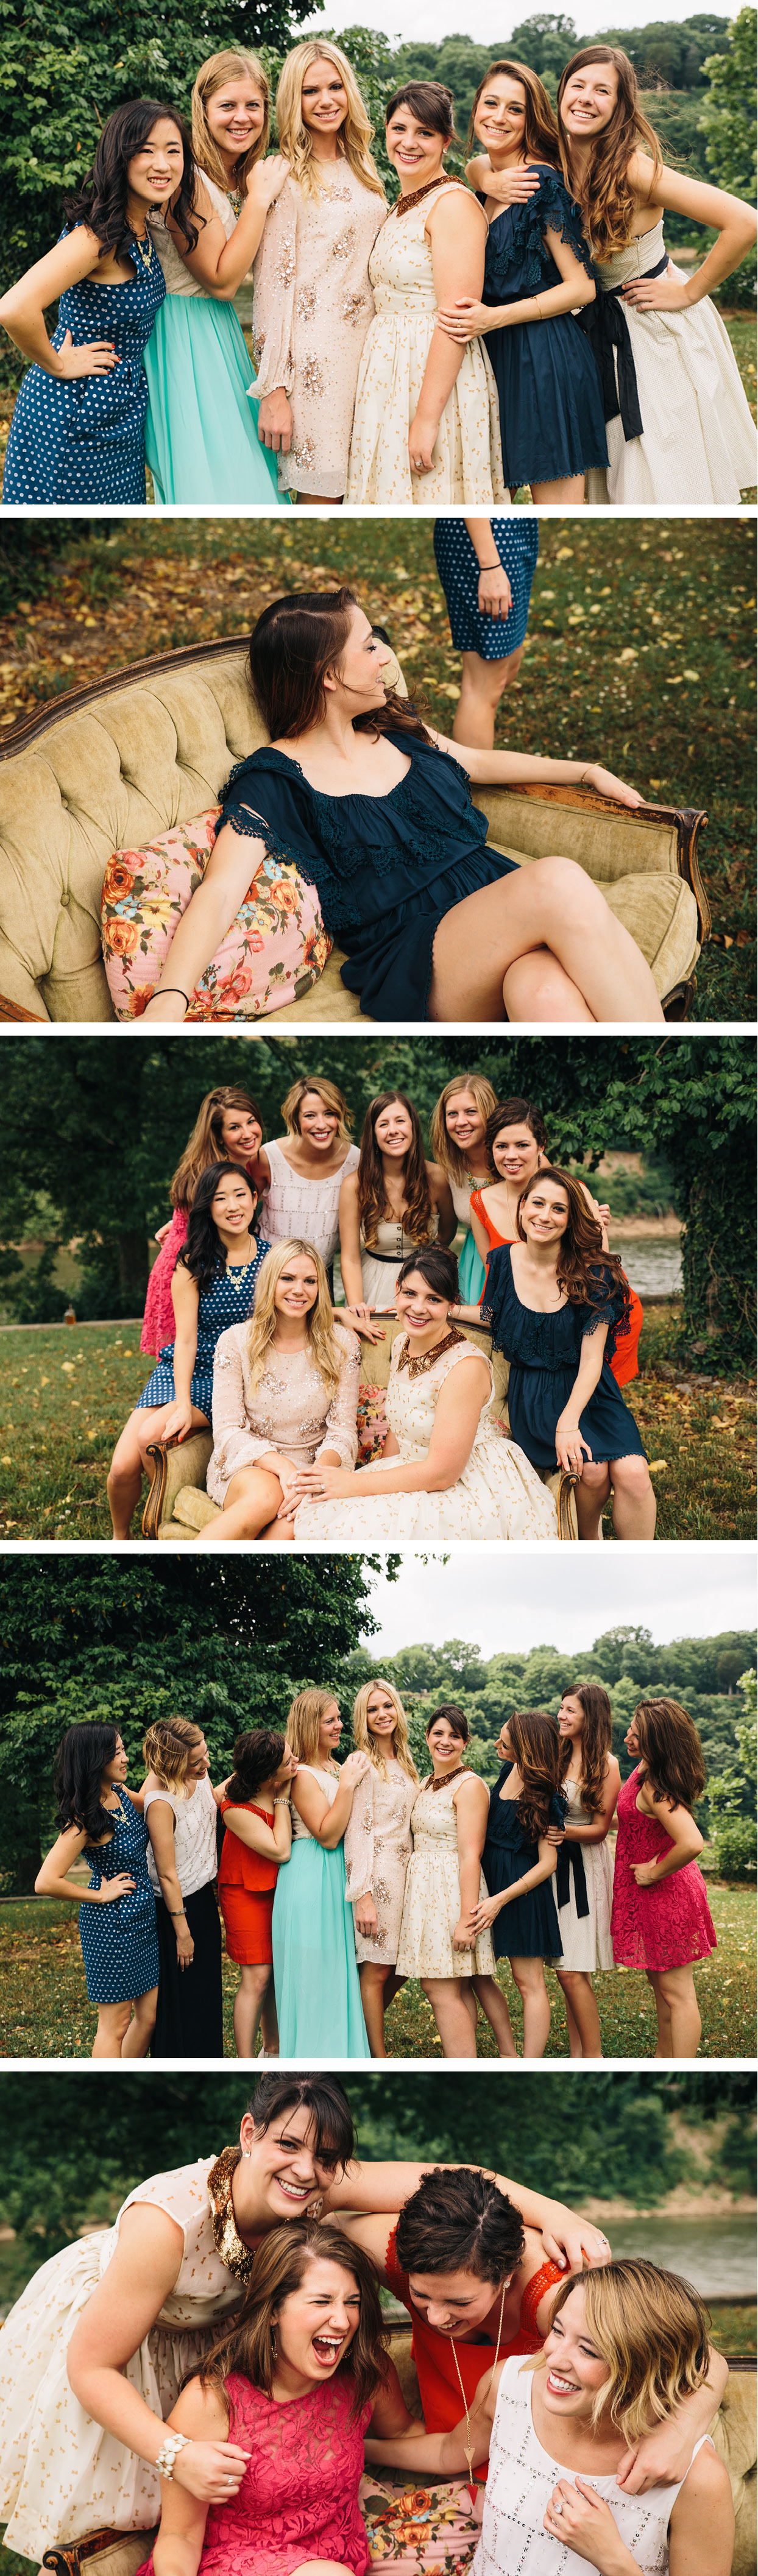 CK-Photo-Nashville-Wedding-Lifestyle-Photographer-cw7.jpg